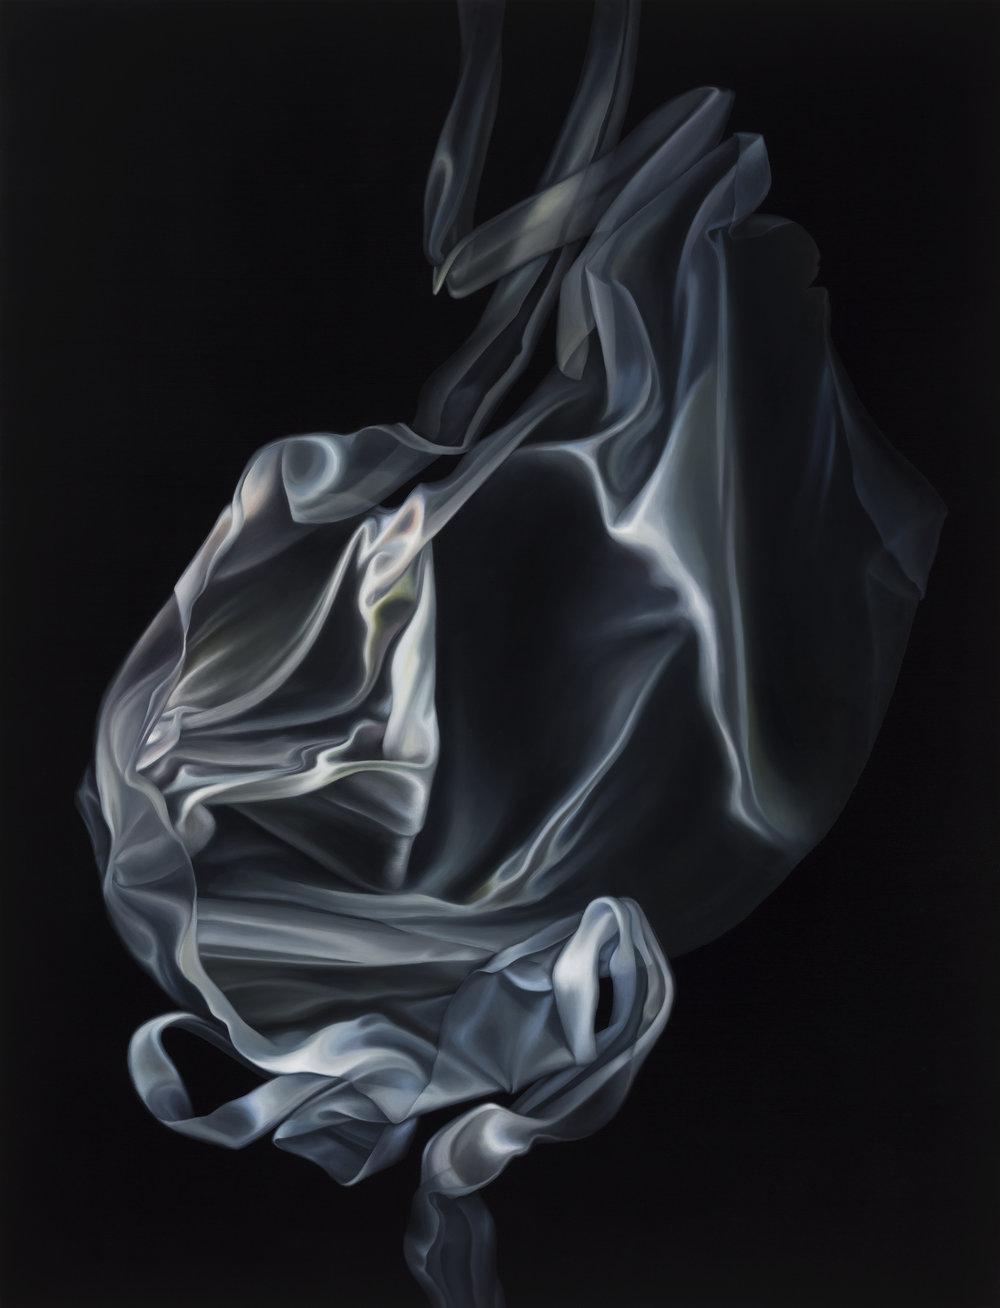 Untitled, 2016. Oil on board, 75 x 50 cm